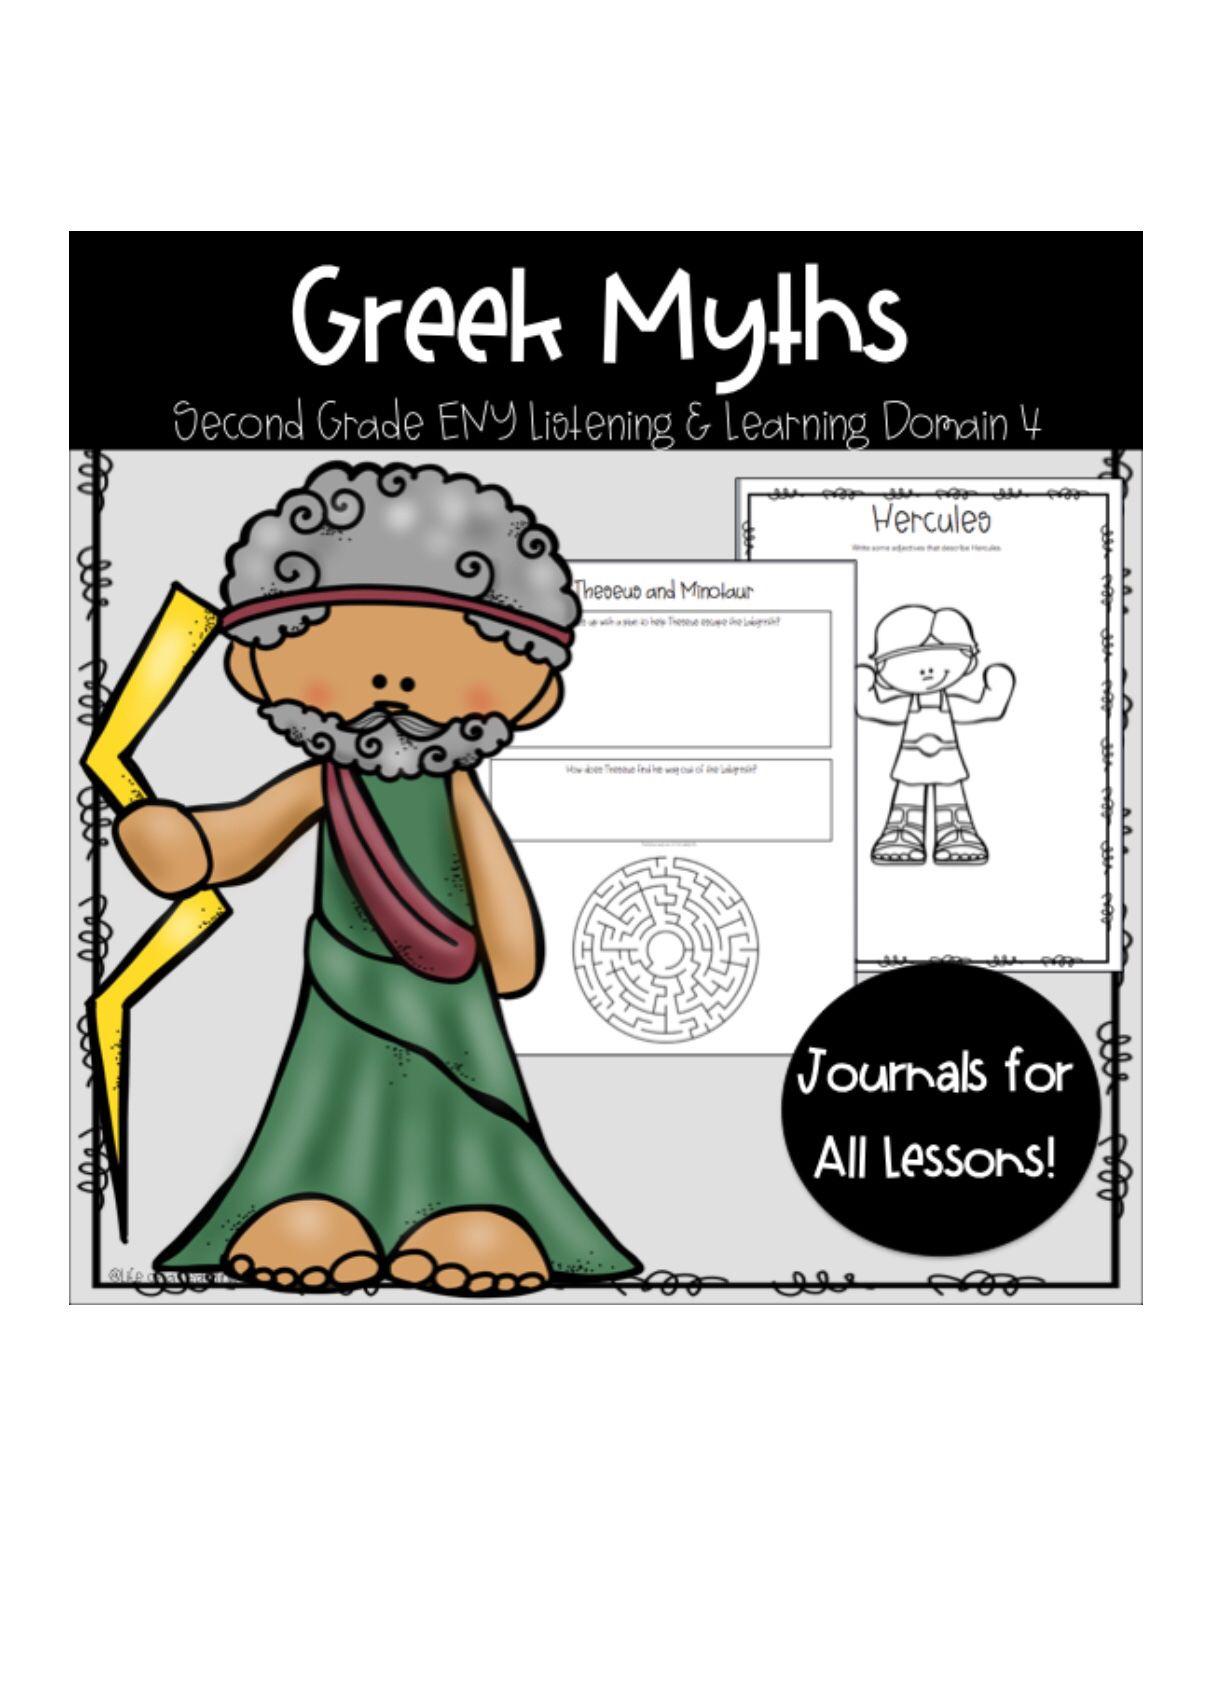 Ckla Eny Greek Myths Grade 2 Domain 4 Listening Journal